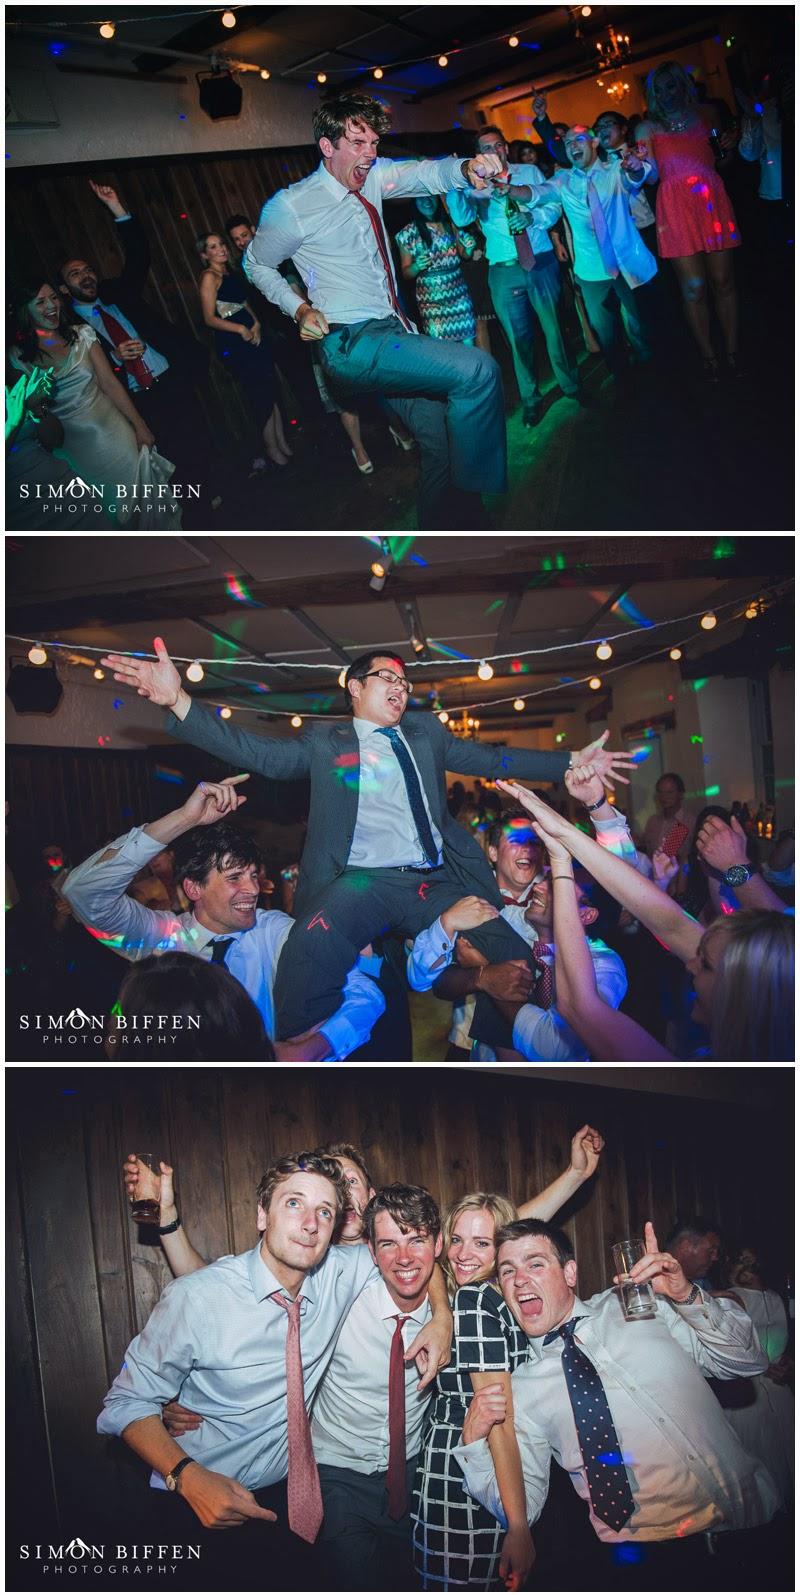 Wedding dancing at Pennard House